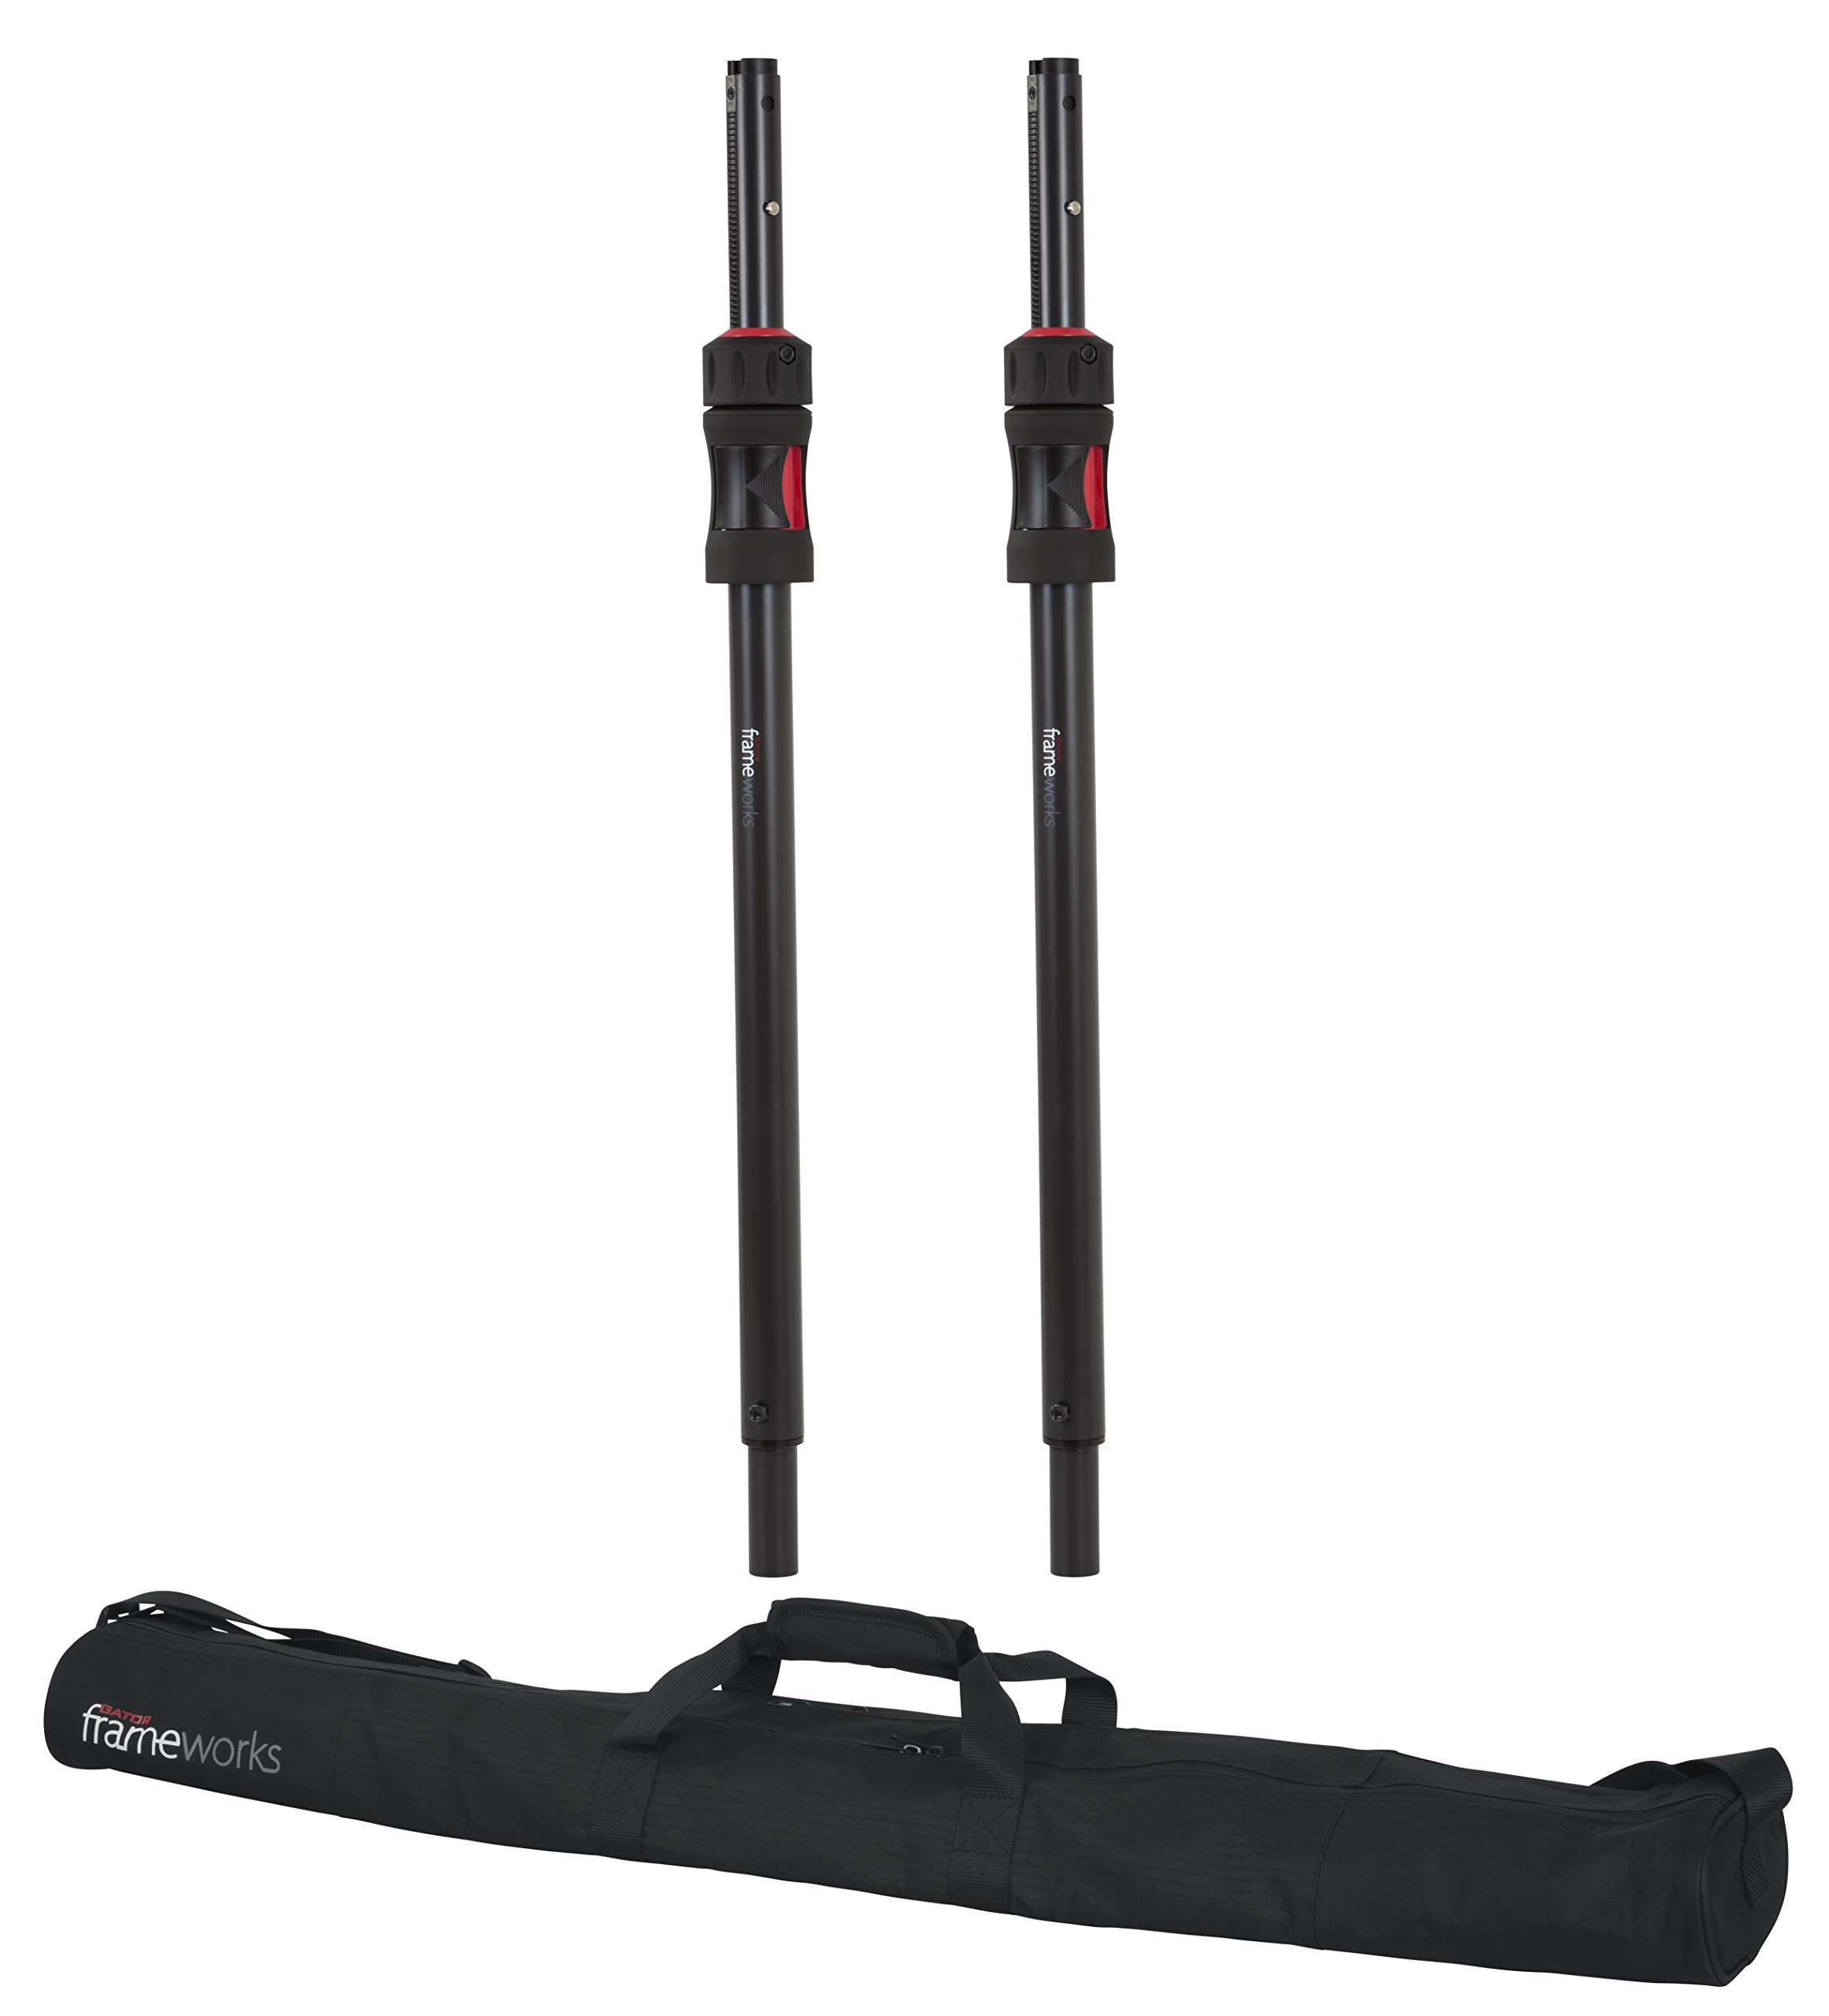 Gator Frameworks GFW-ID-SPKR-SPSET Series Speaker Sub Pole, Set of 2 with Nylon Carry Bag